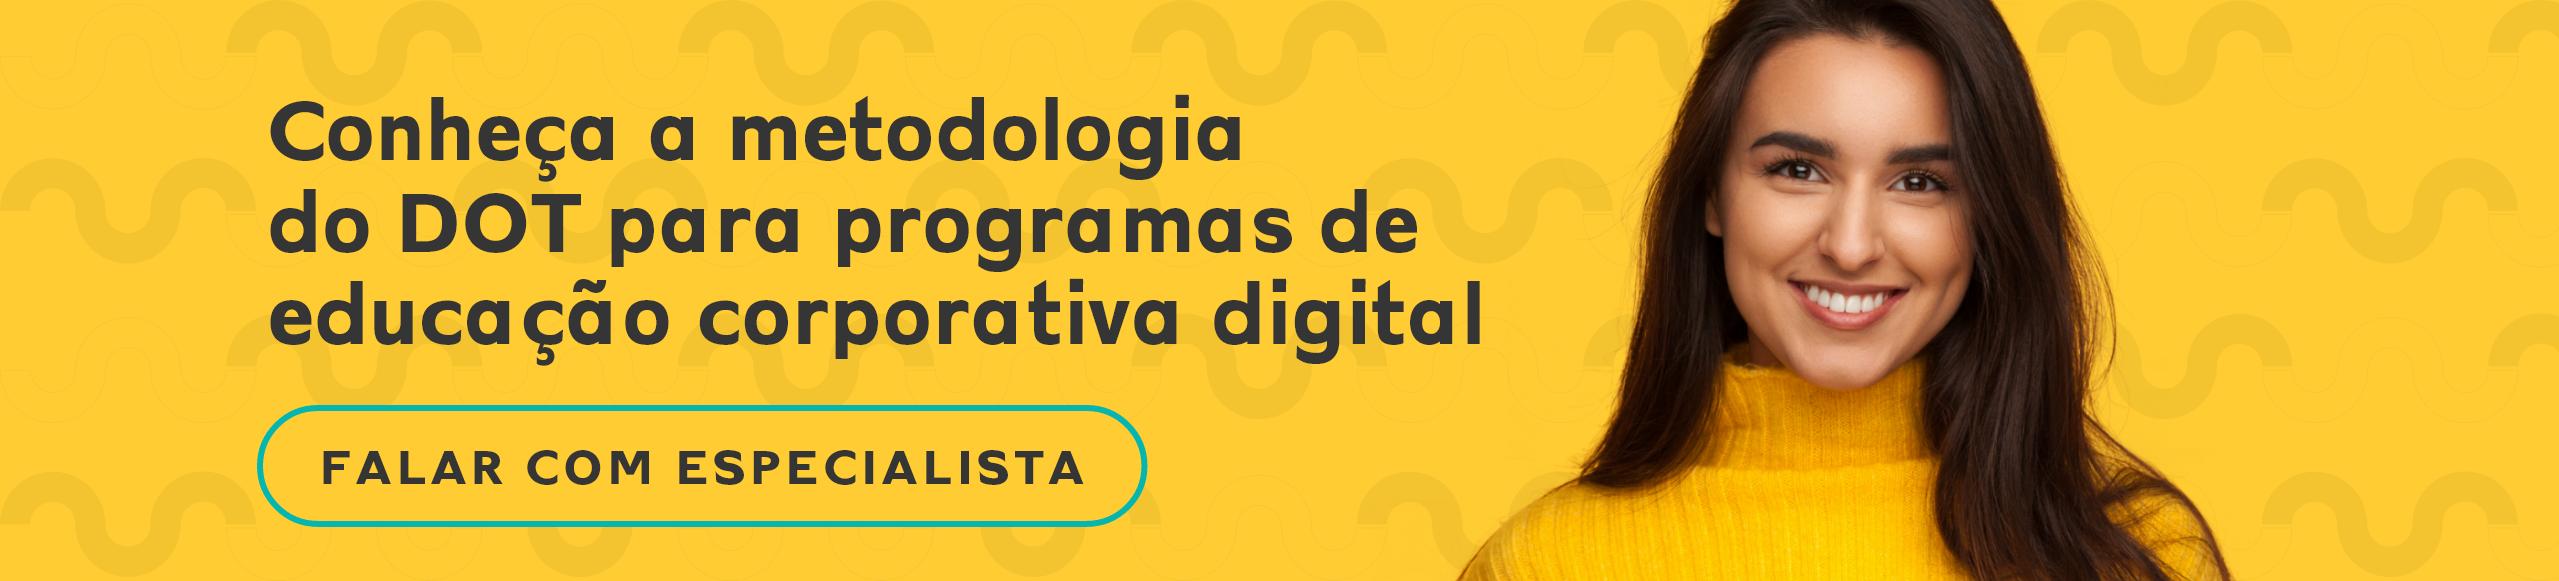 blog-dot-digital-group-educacao-corporativa-para-capacitar-equipes-hibridas